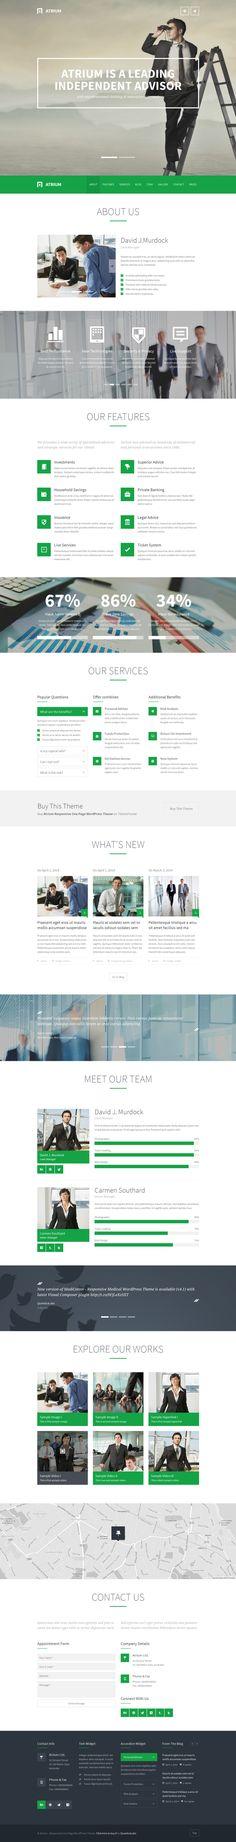 Atrium – Responsive One Page WordPress Theme by CreAtive Web Themes, via Behance